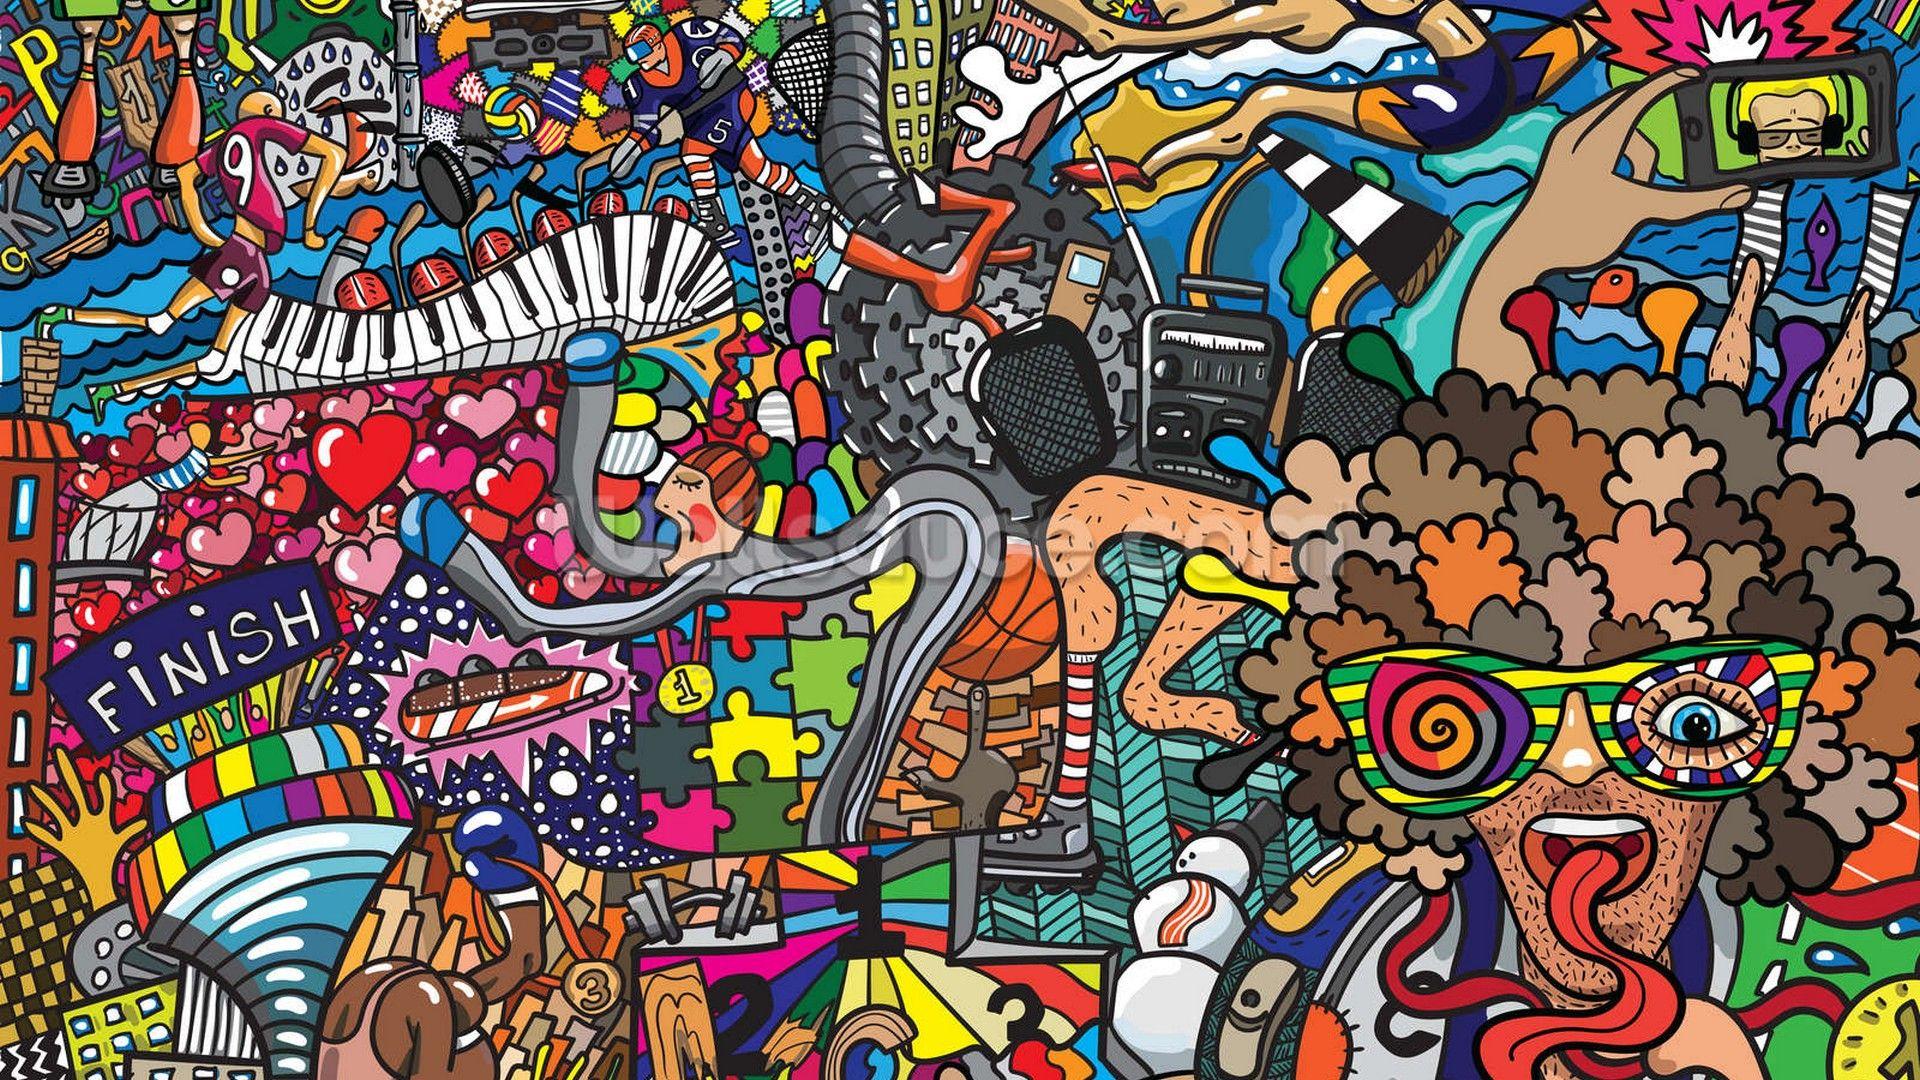 Graffiti Letters Hd Wallpaper 2021 Live Wallpaper Hd Graffiti Wallpaper Graffiti Wall Art Graffiti